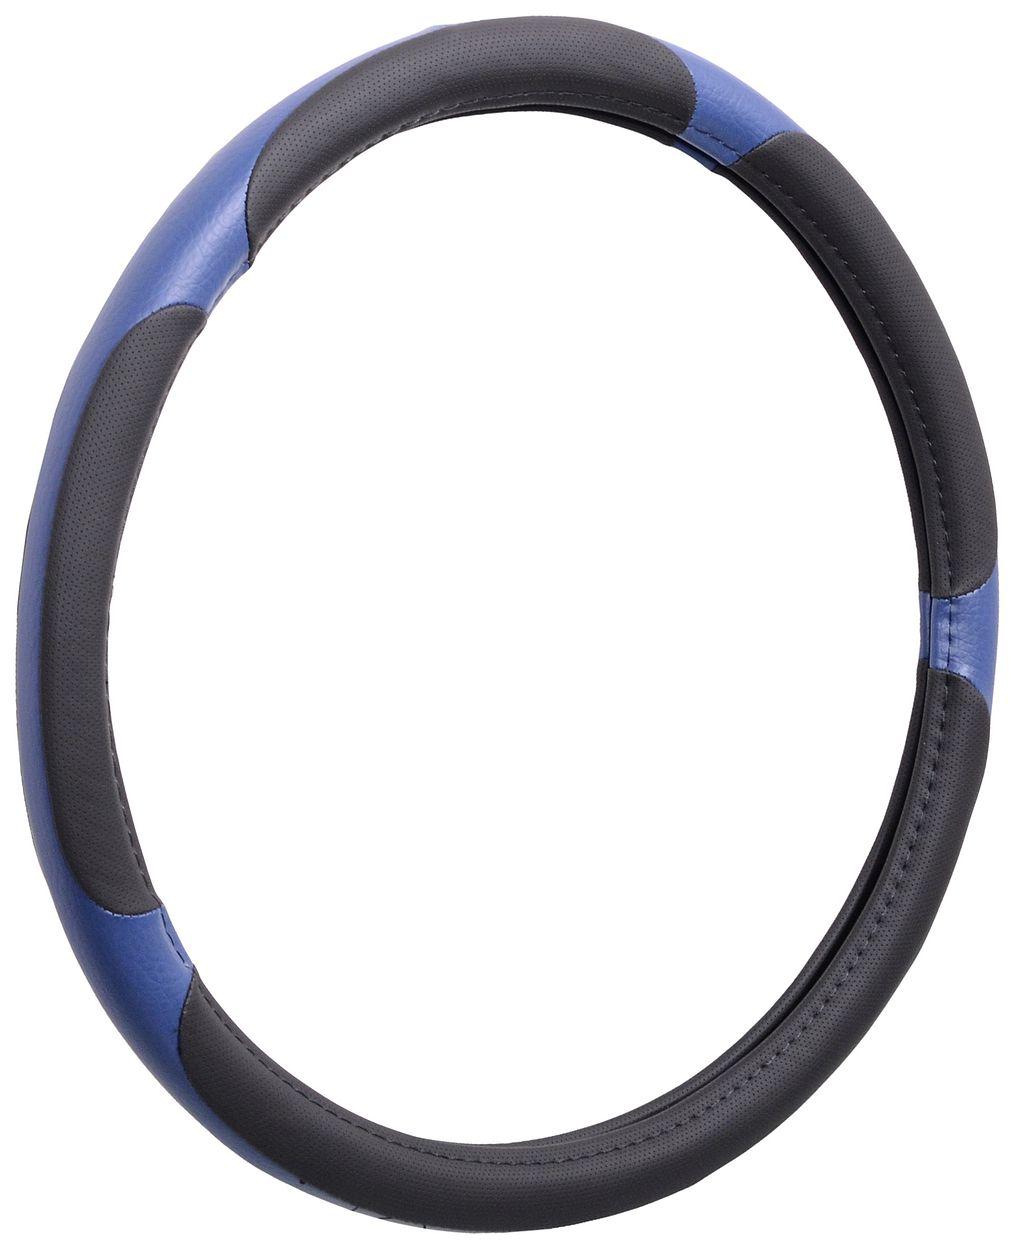 Potah volantu GRIP LARGE 42cm modrý